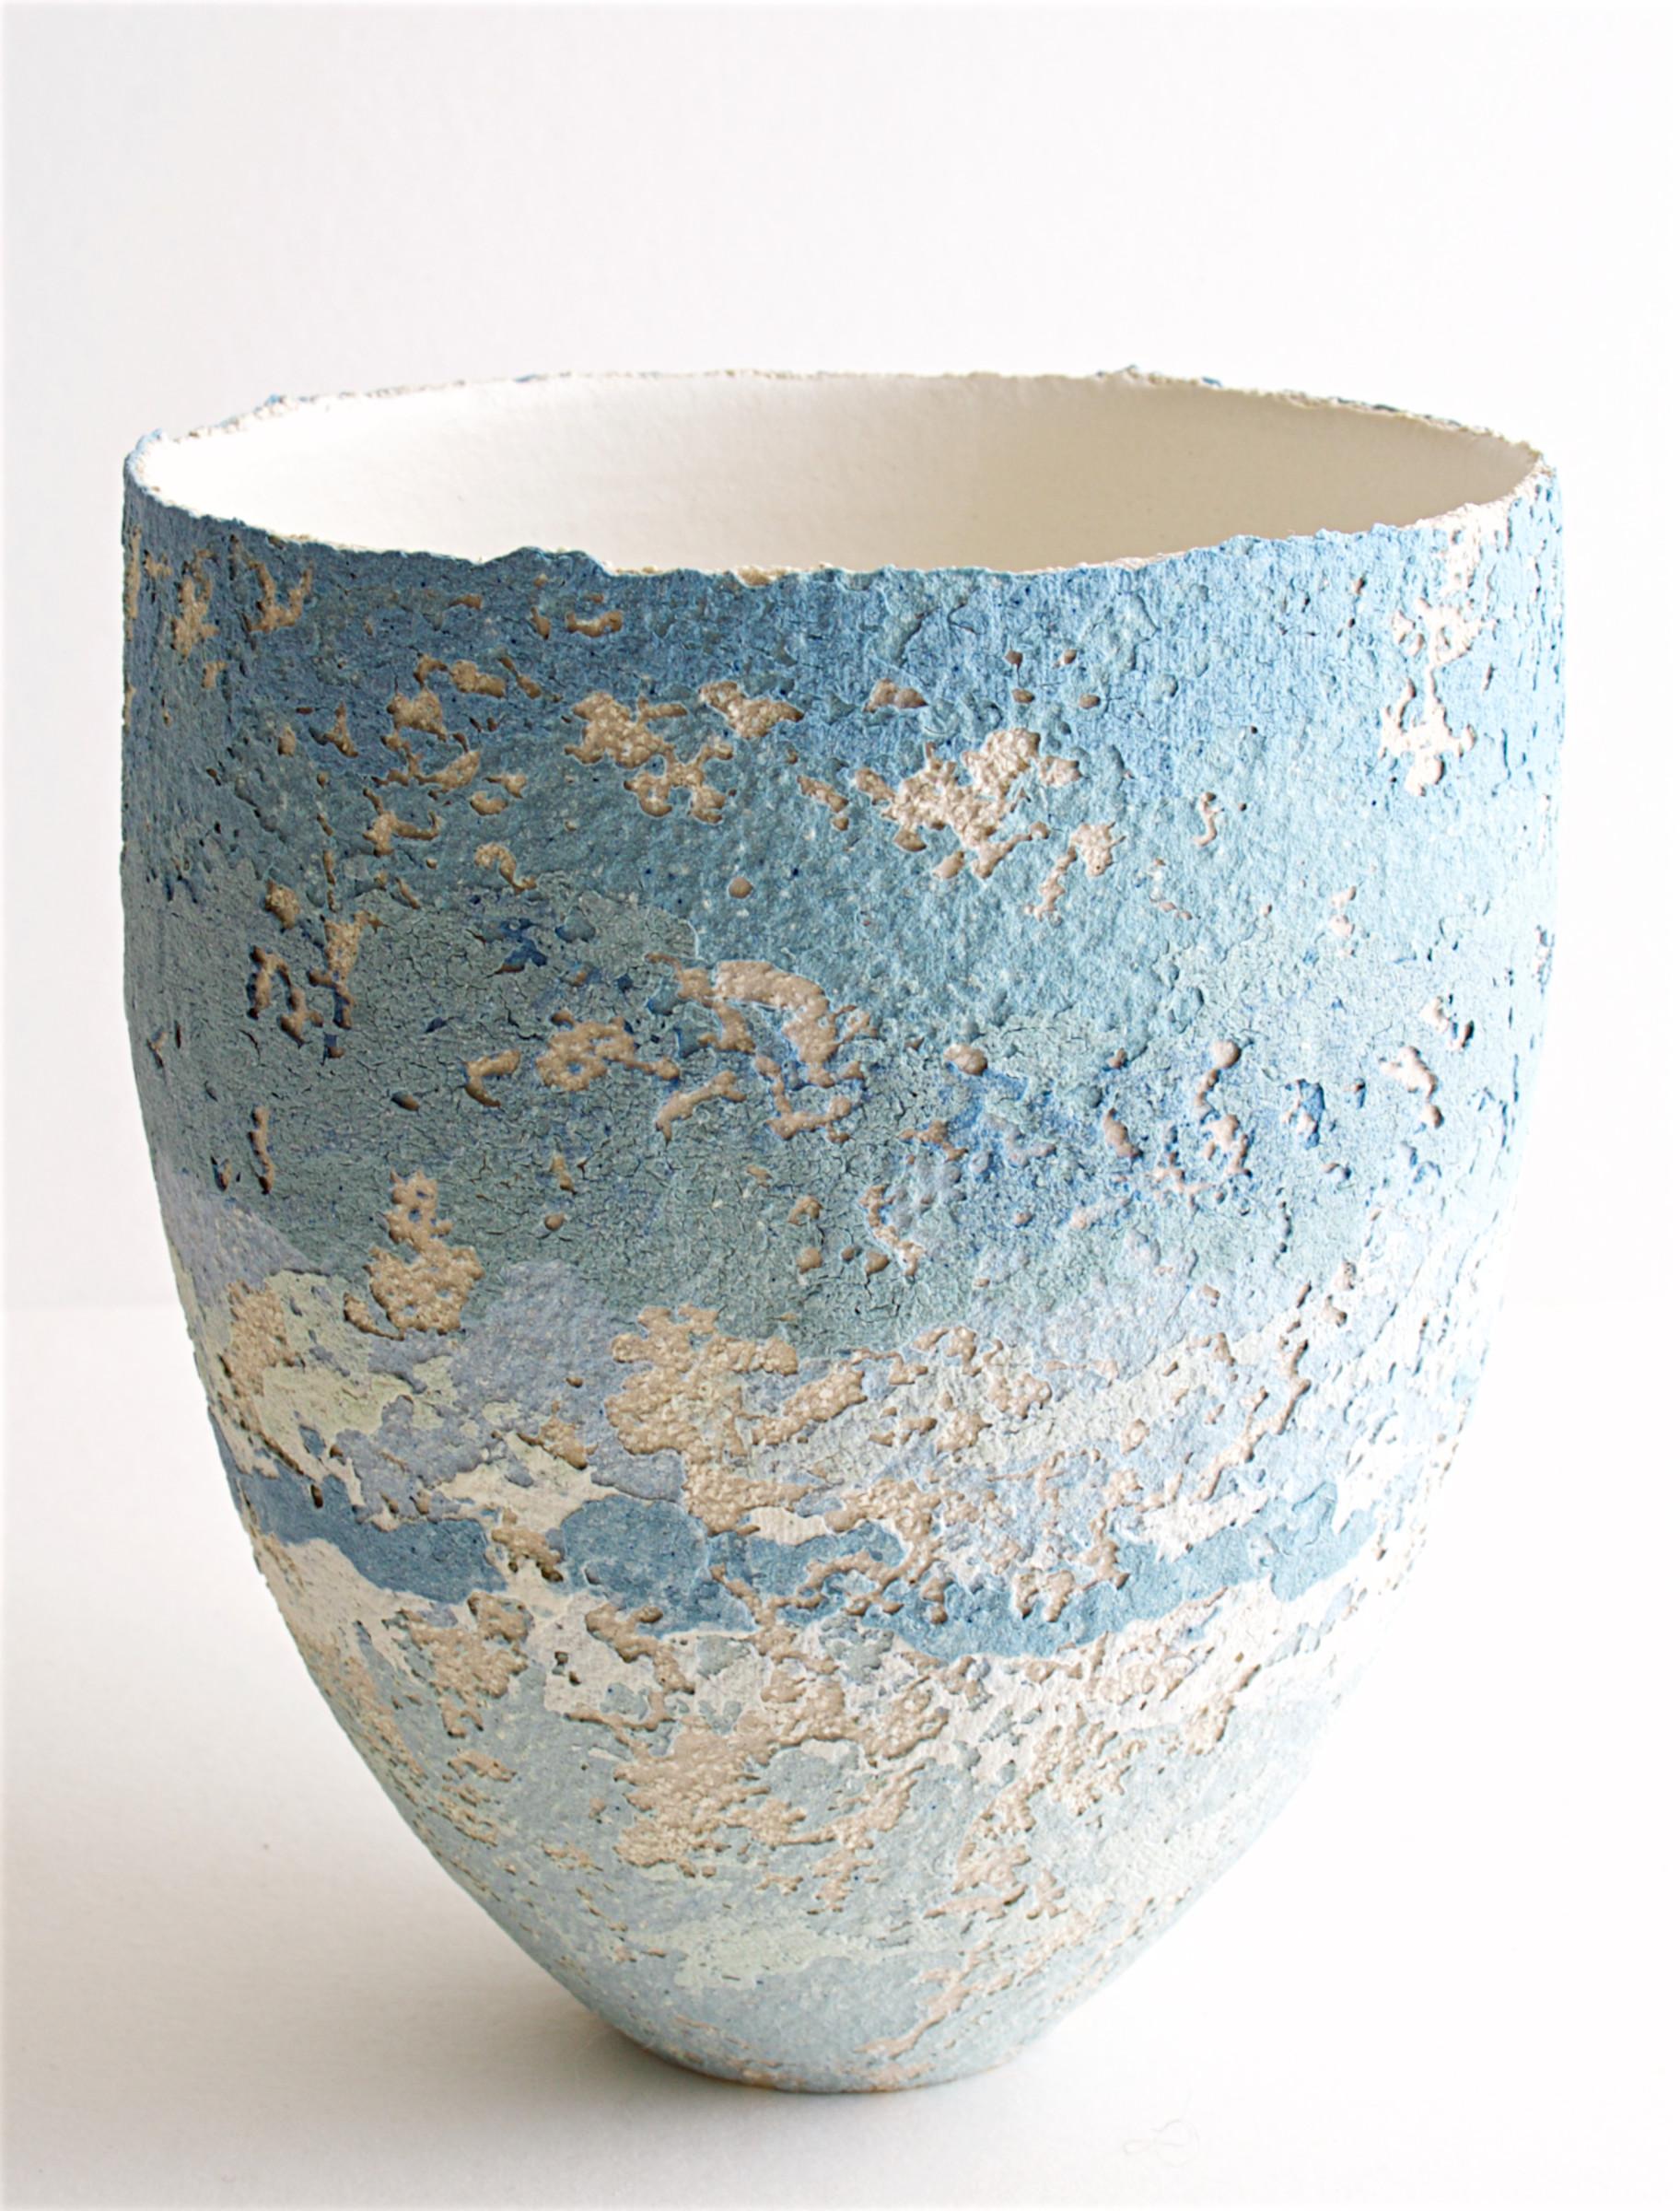 "<span class=""link fancybox-details-link""><a href=""/artists/79-clare-conrad/works/6928-clare-conrad-vessel-2020/"">View Detail Page</a></span><div class=""artist""><strong>Clare Conrad</strong></div> <div class=""title""><em>Vessel</em>, 2020</div> <div class=""medium"">Stoneware</div> <div class=""dimensions"">h. 12.5 cm</div><div class=""copyright_line"">Copyright The Artist</div>"